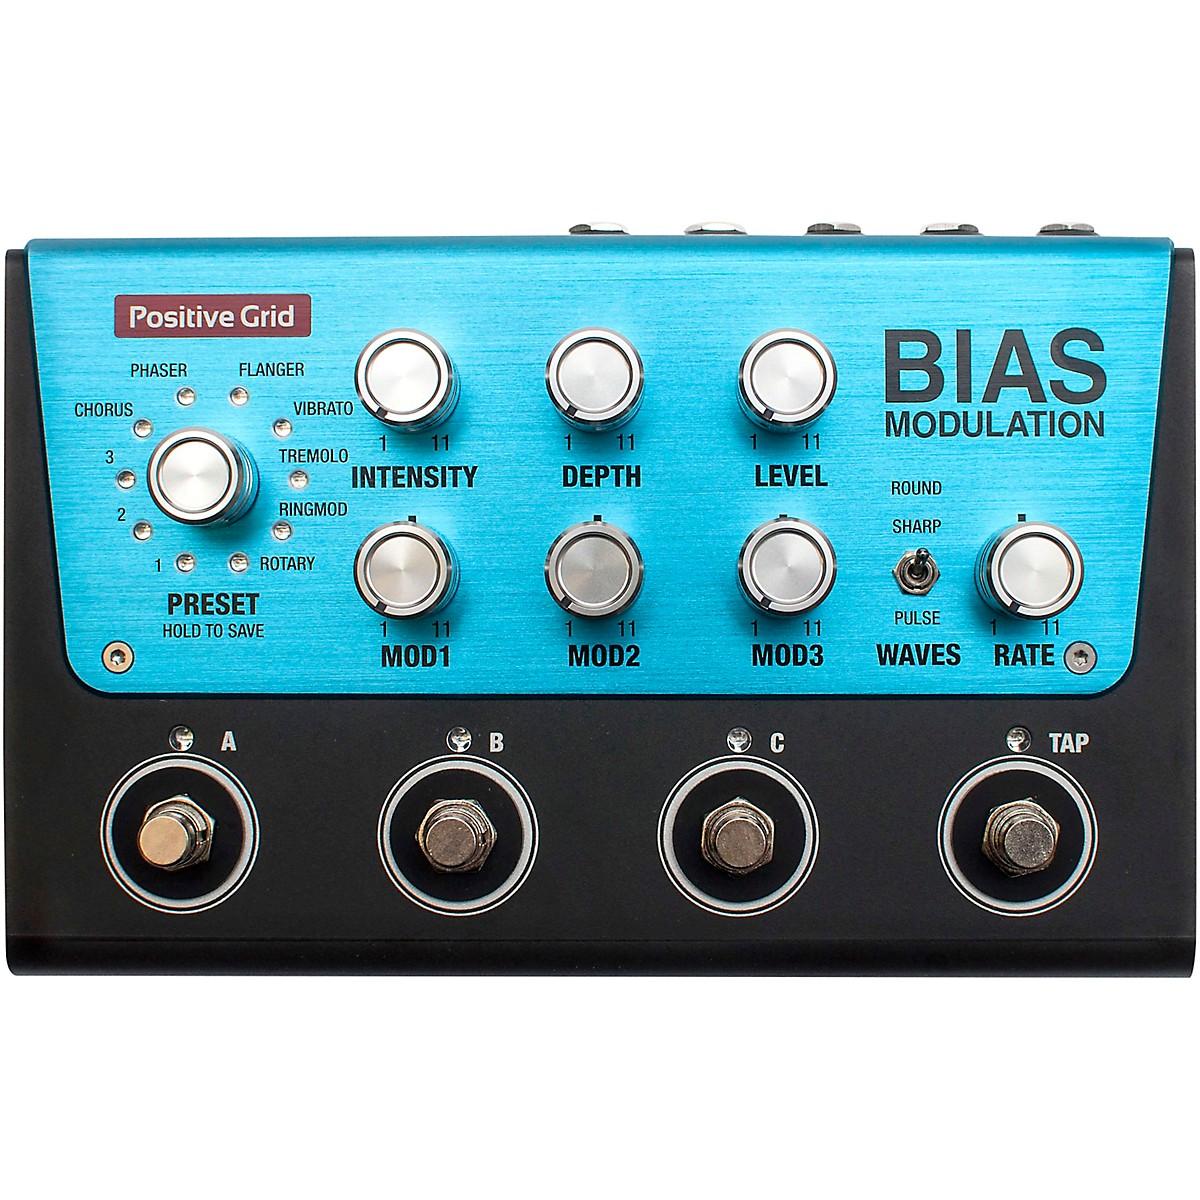 Positive Grid BIAS Modulation Pro Effects Pedal